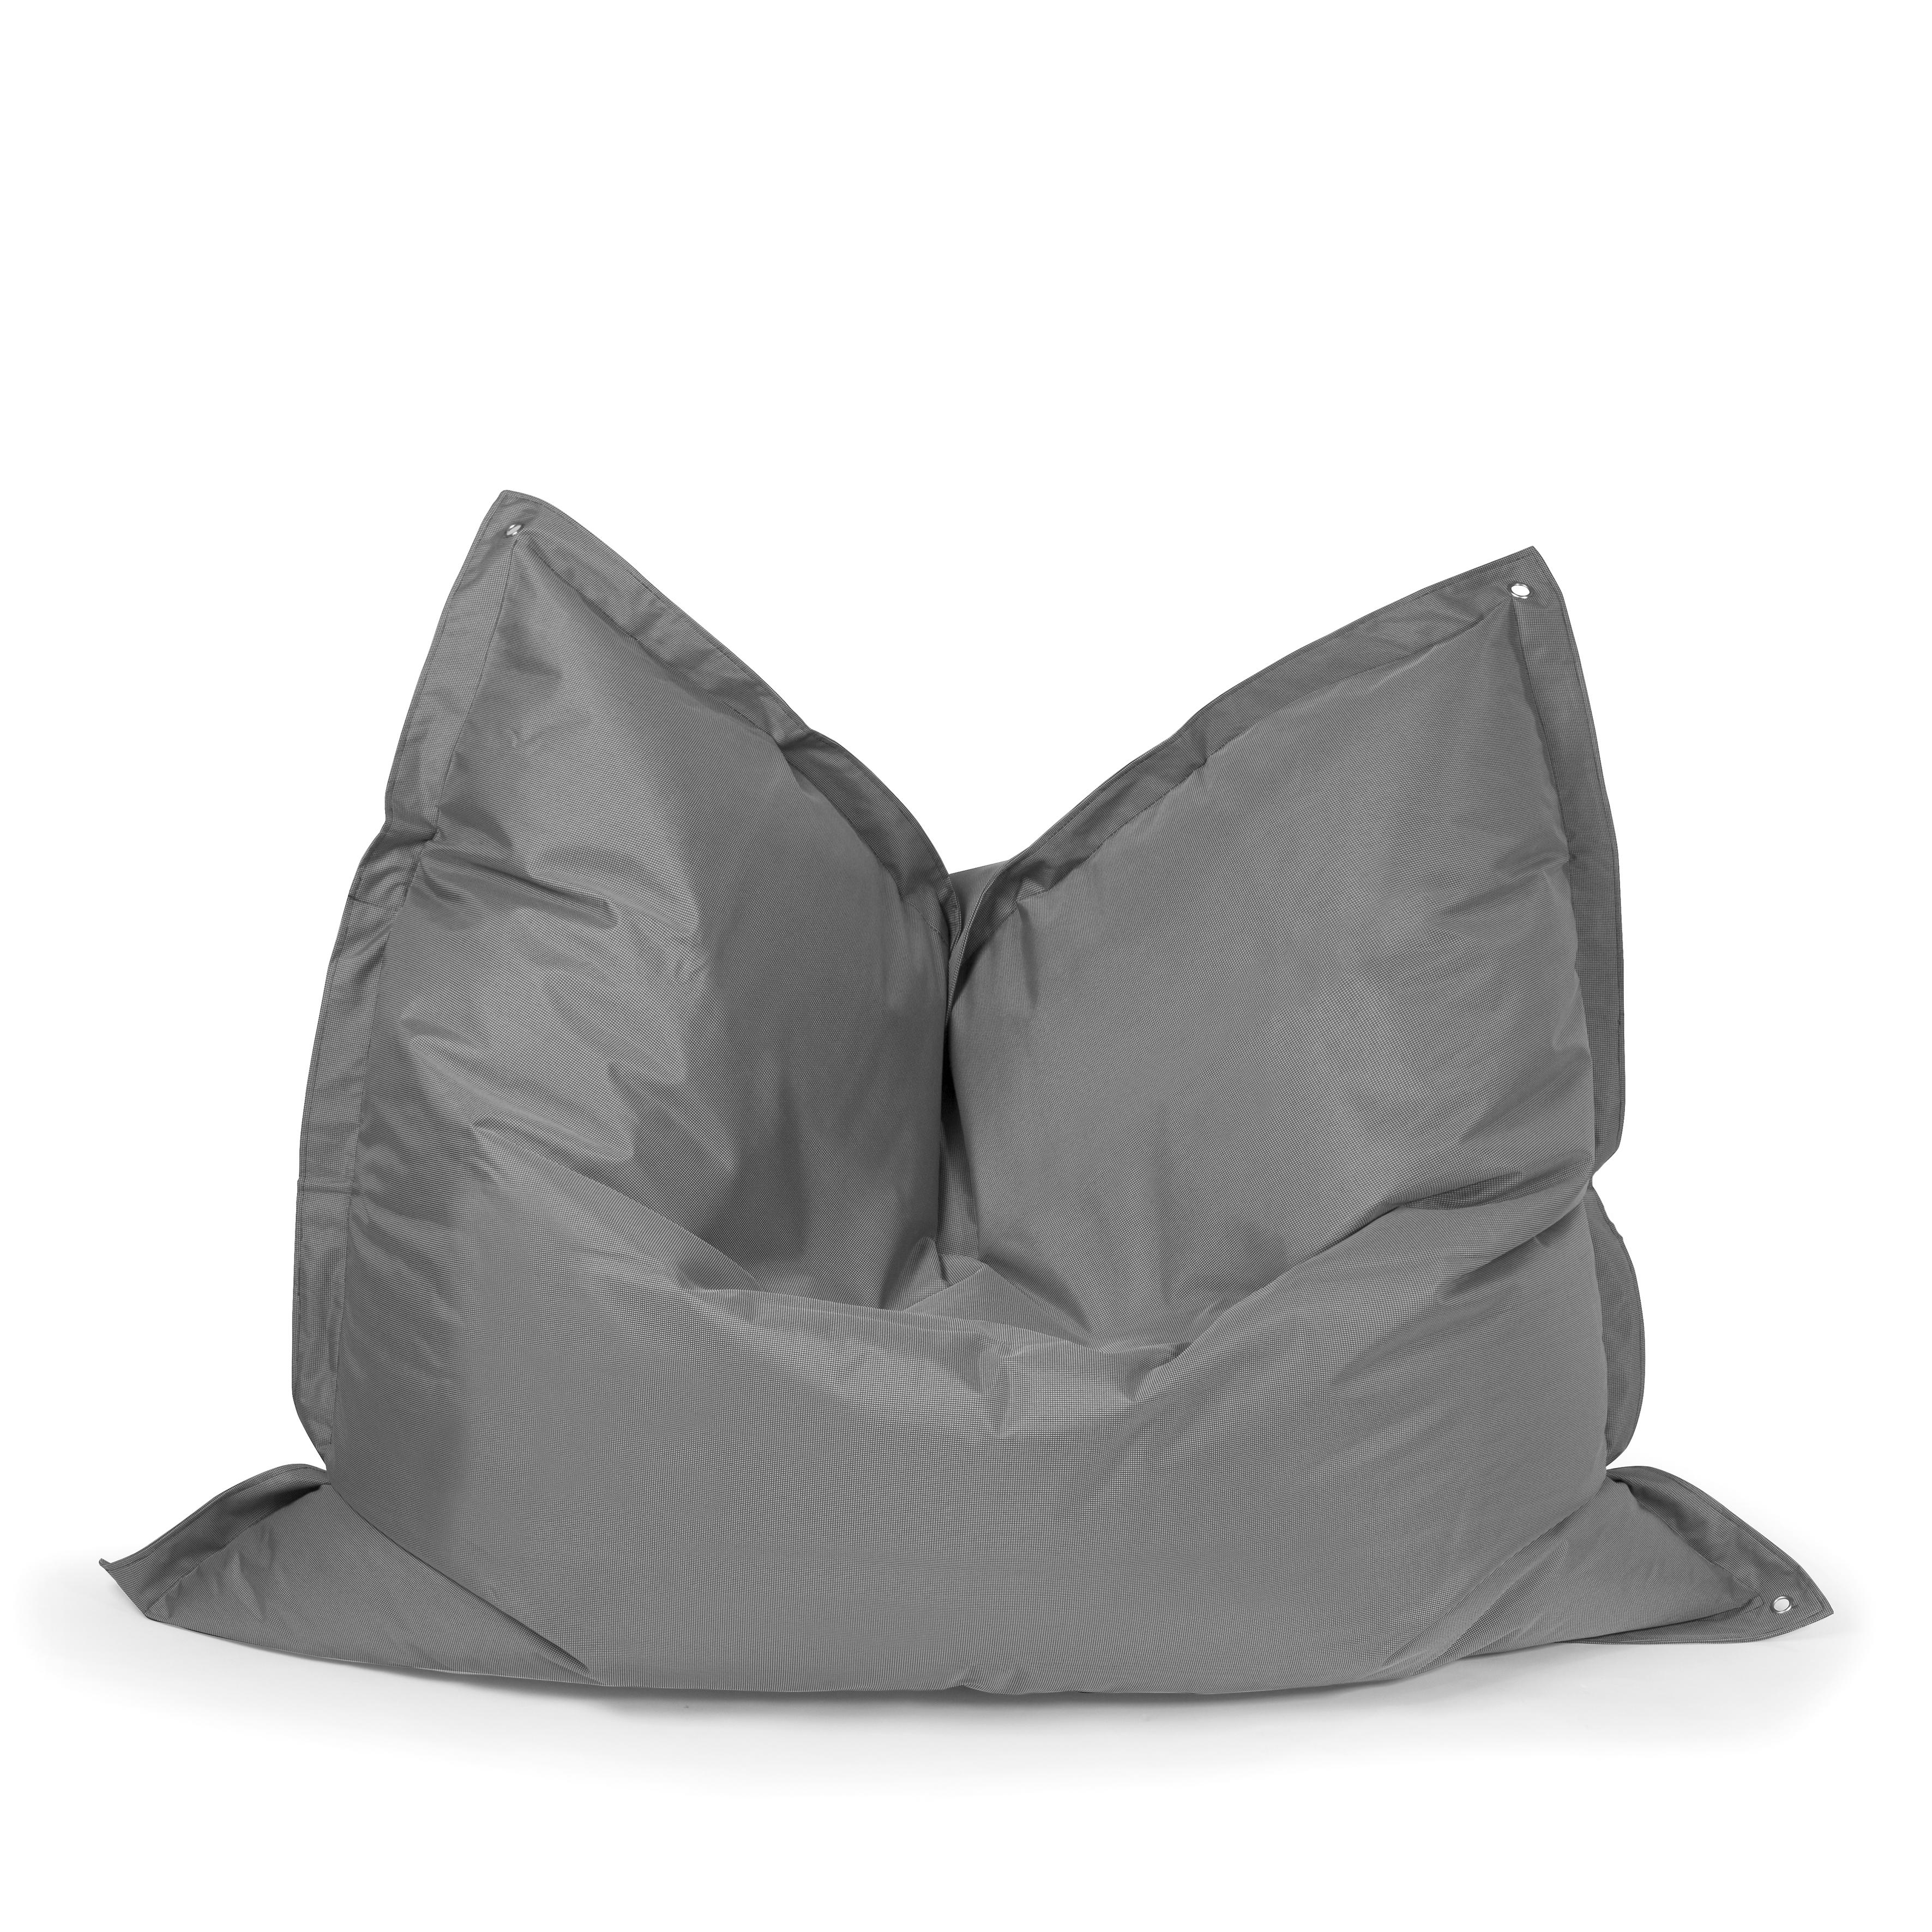 outbag outdoor sitzsack meadow 1 60 x 1 30 m wetterfest sitzkissen lounge ebay. Black Bedroom Furniture Sets. Home Design Ideas